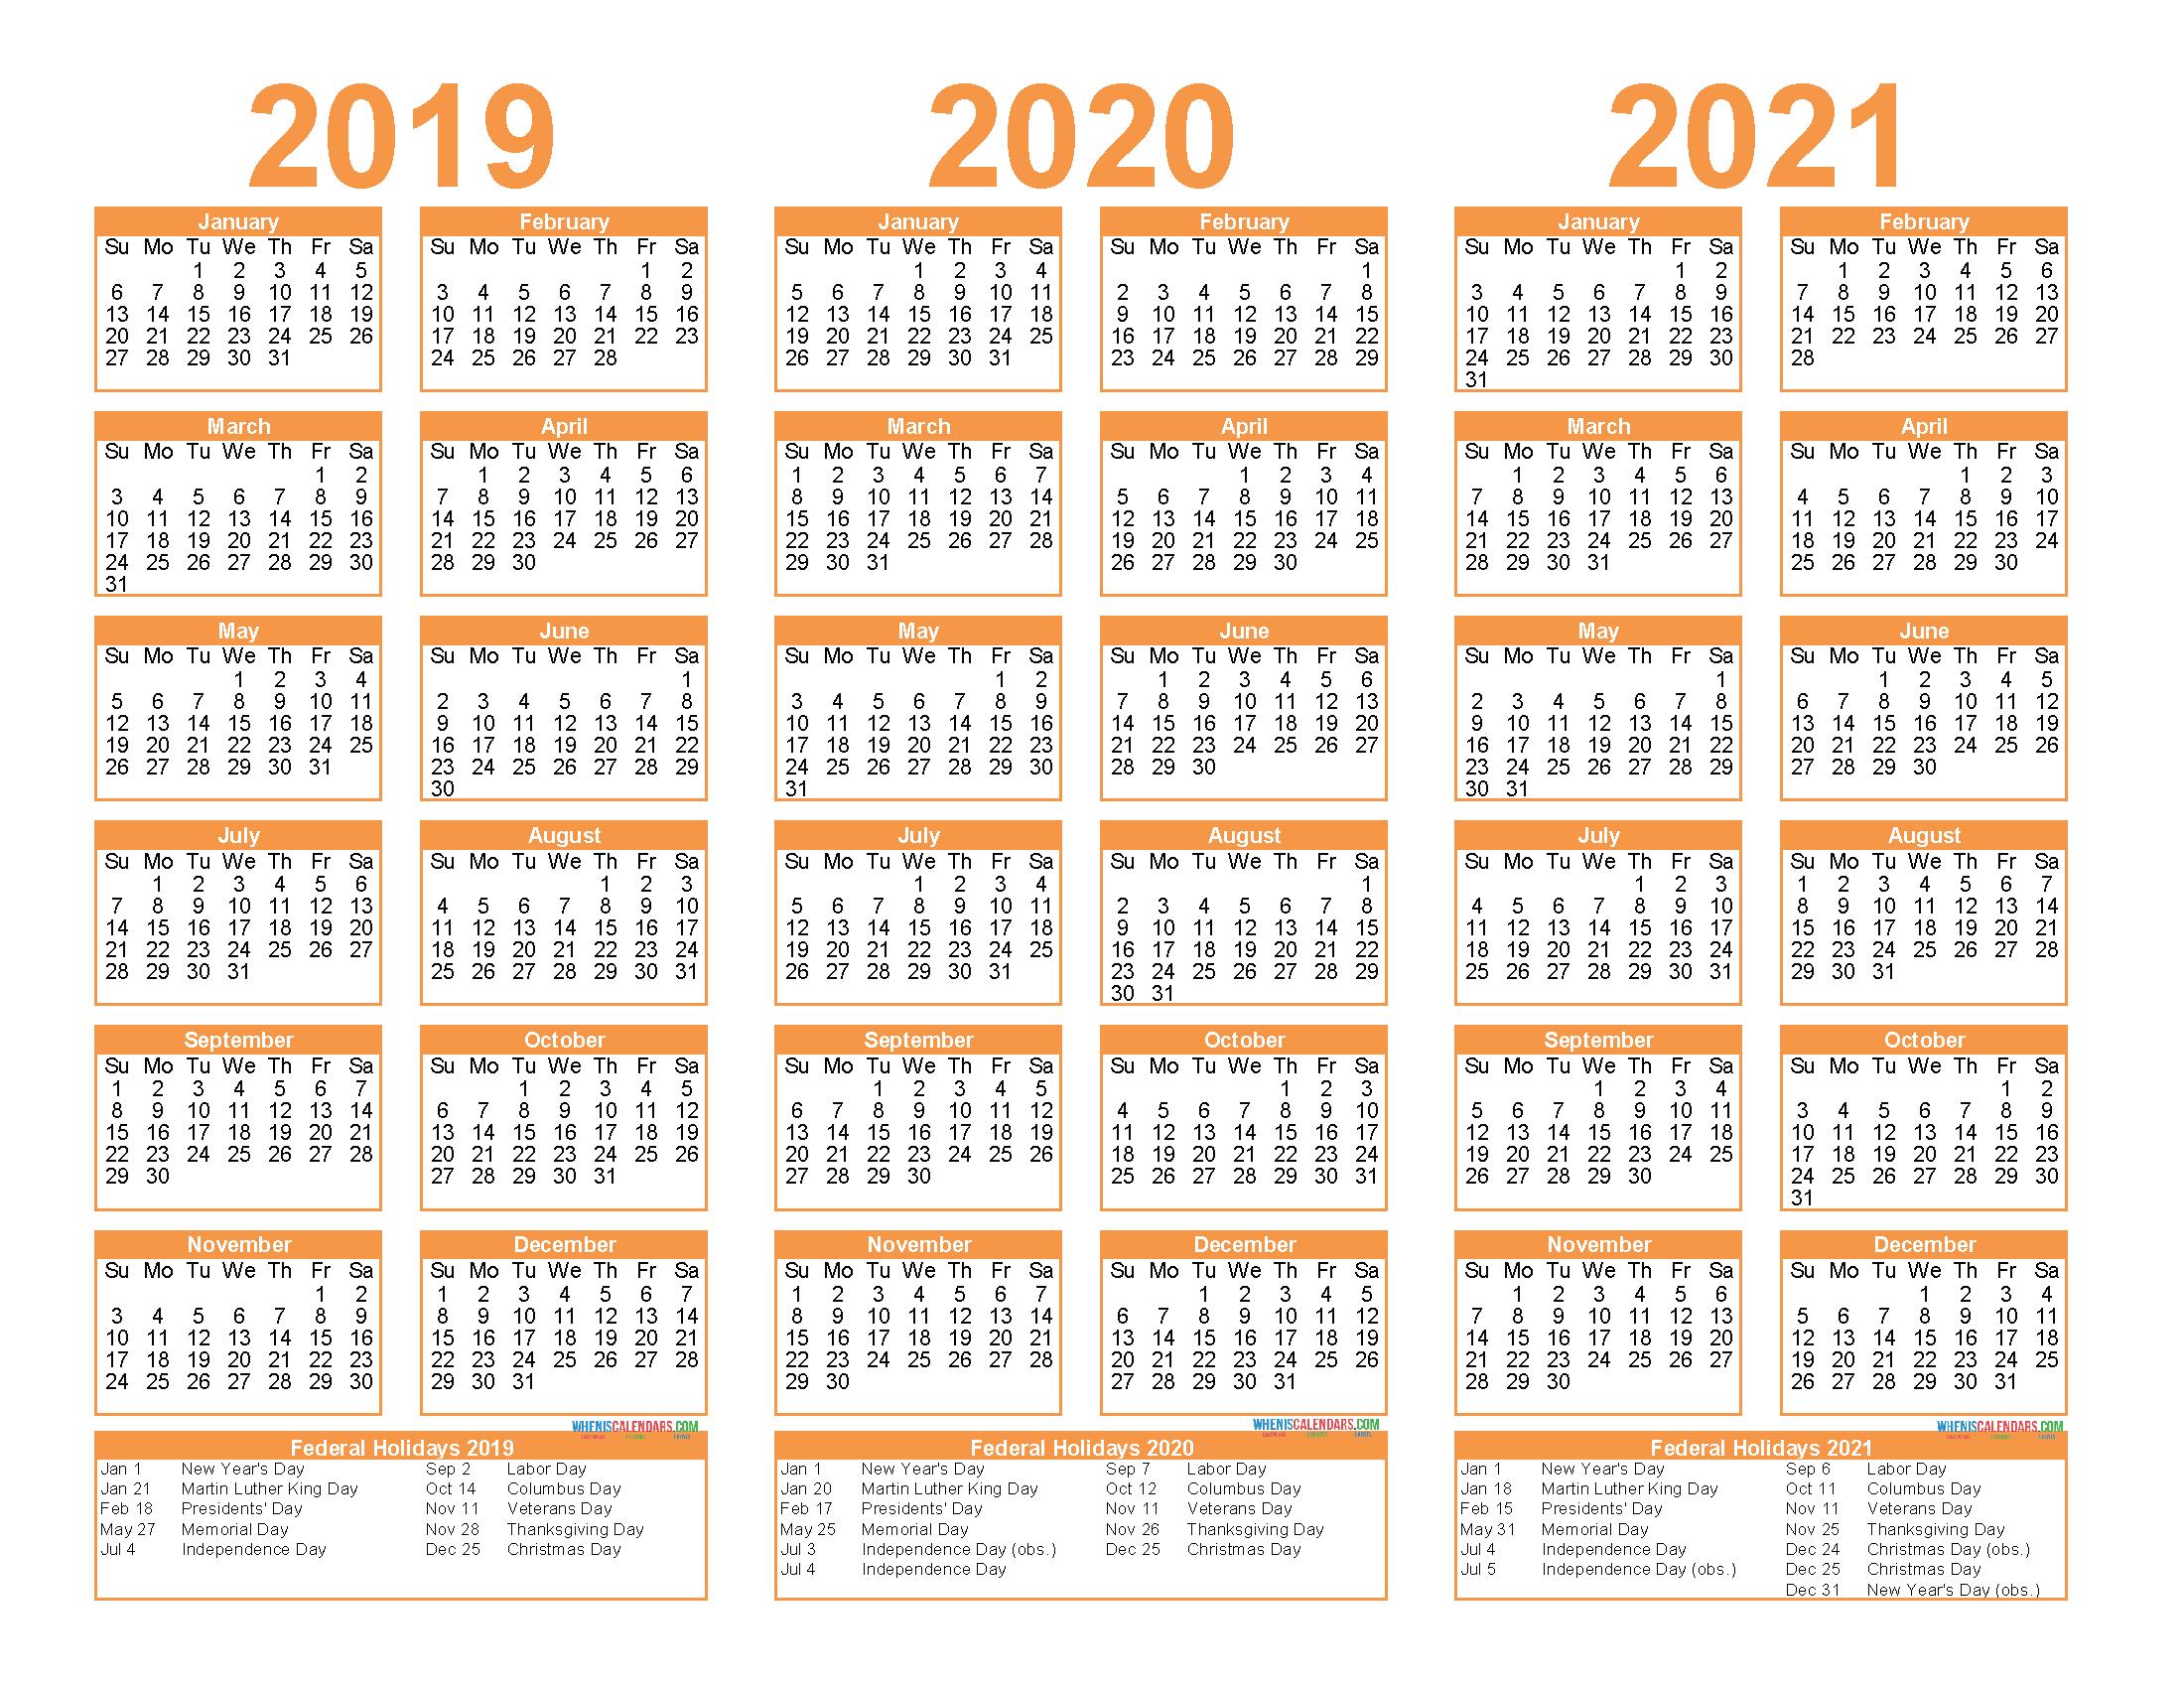 Free Printable 2019 2020 2021 Calendar With Holidays 3